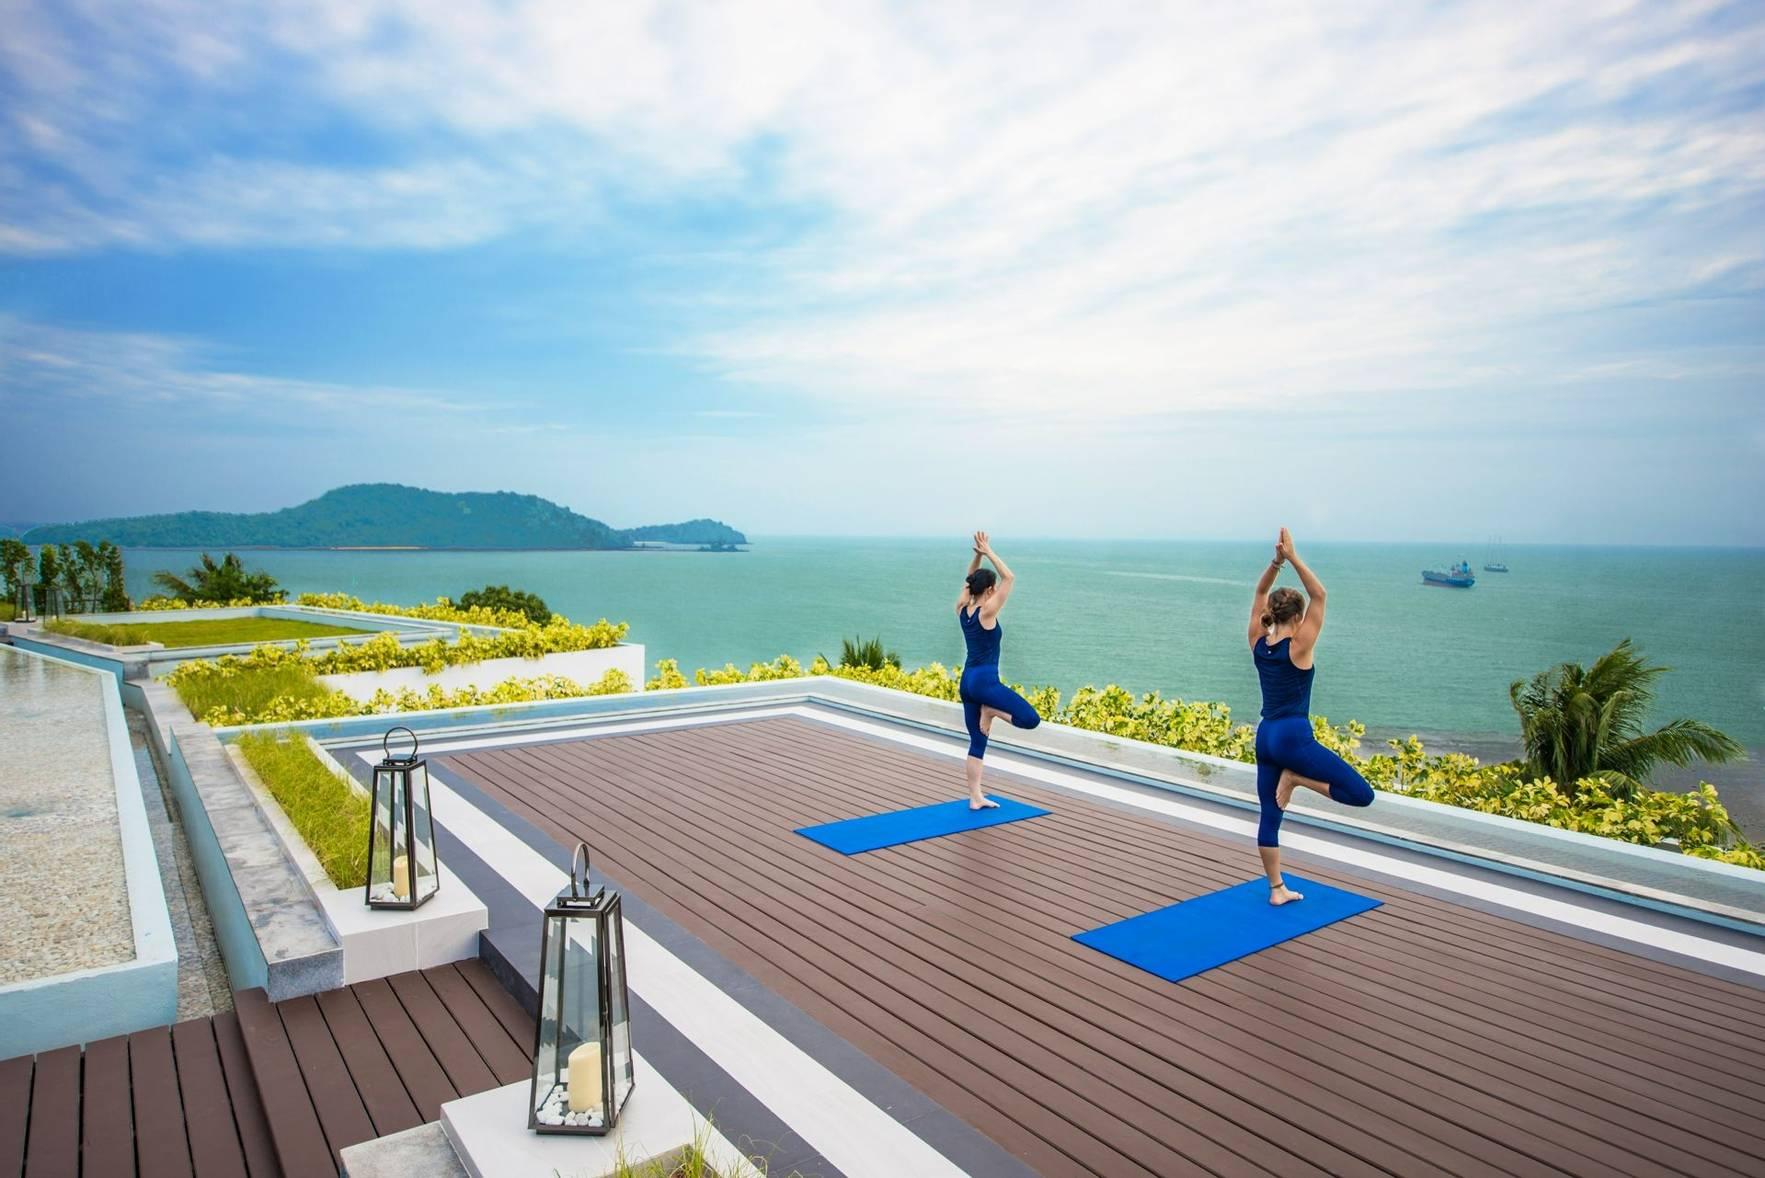 Yoga with Sea View at Amatara Wellness Resort